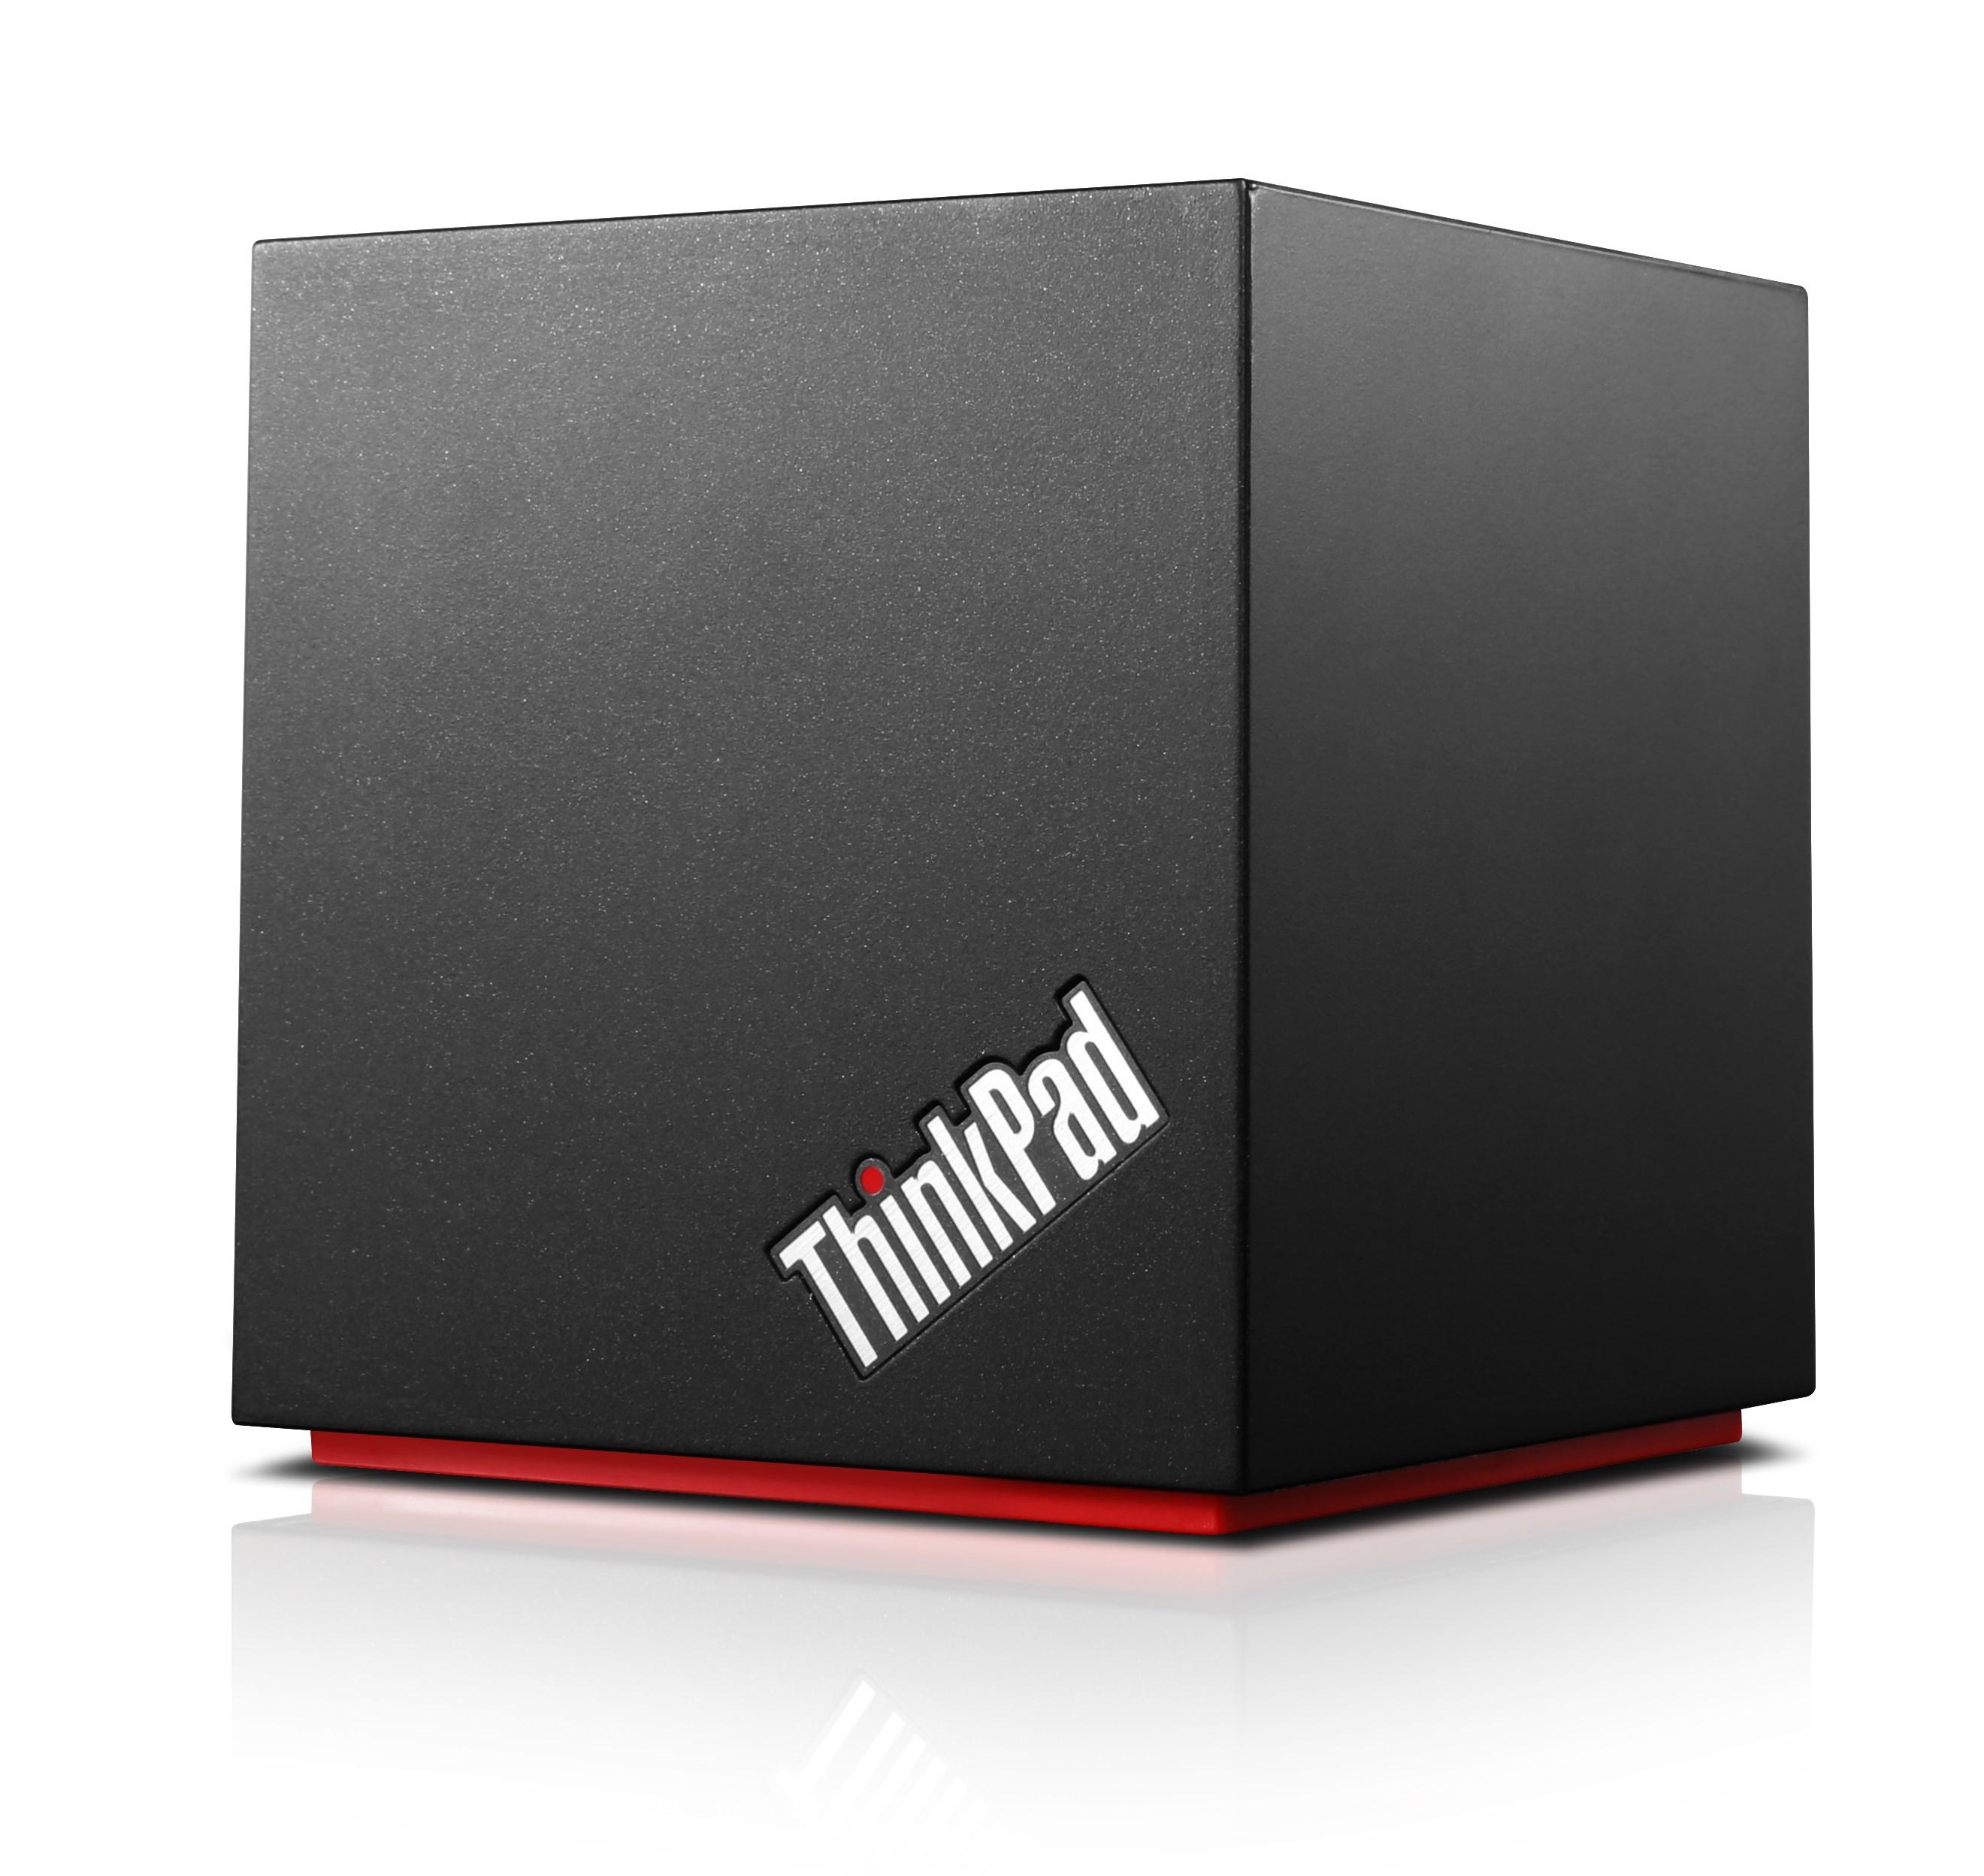 Lenovo ThinkPad WiGig Dock - Drahtlose Docking-Station